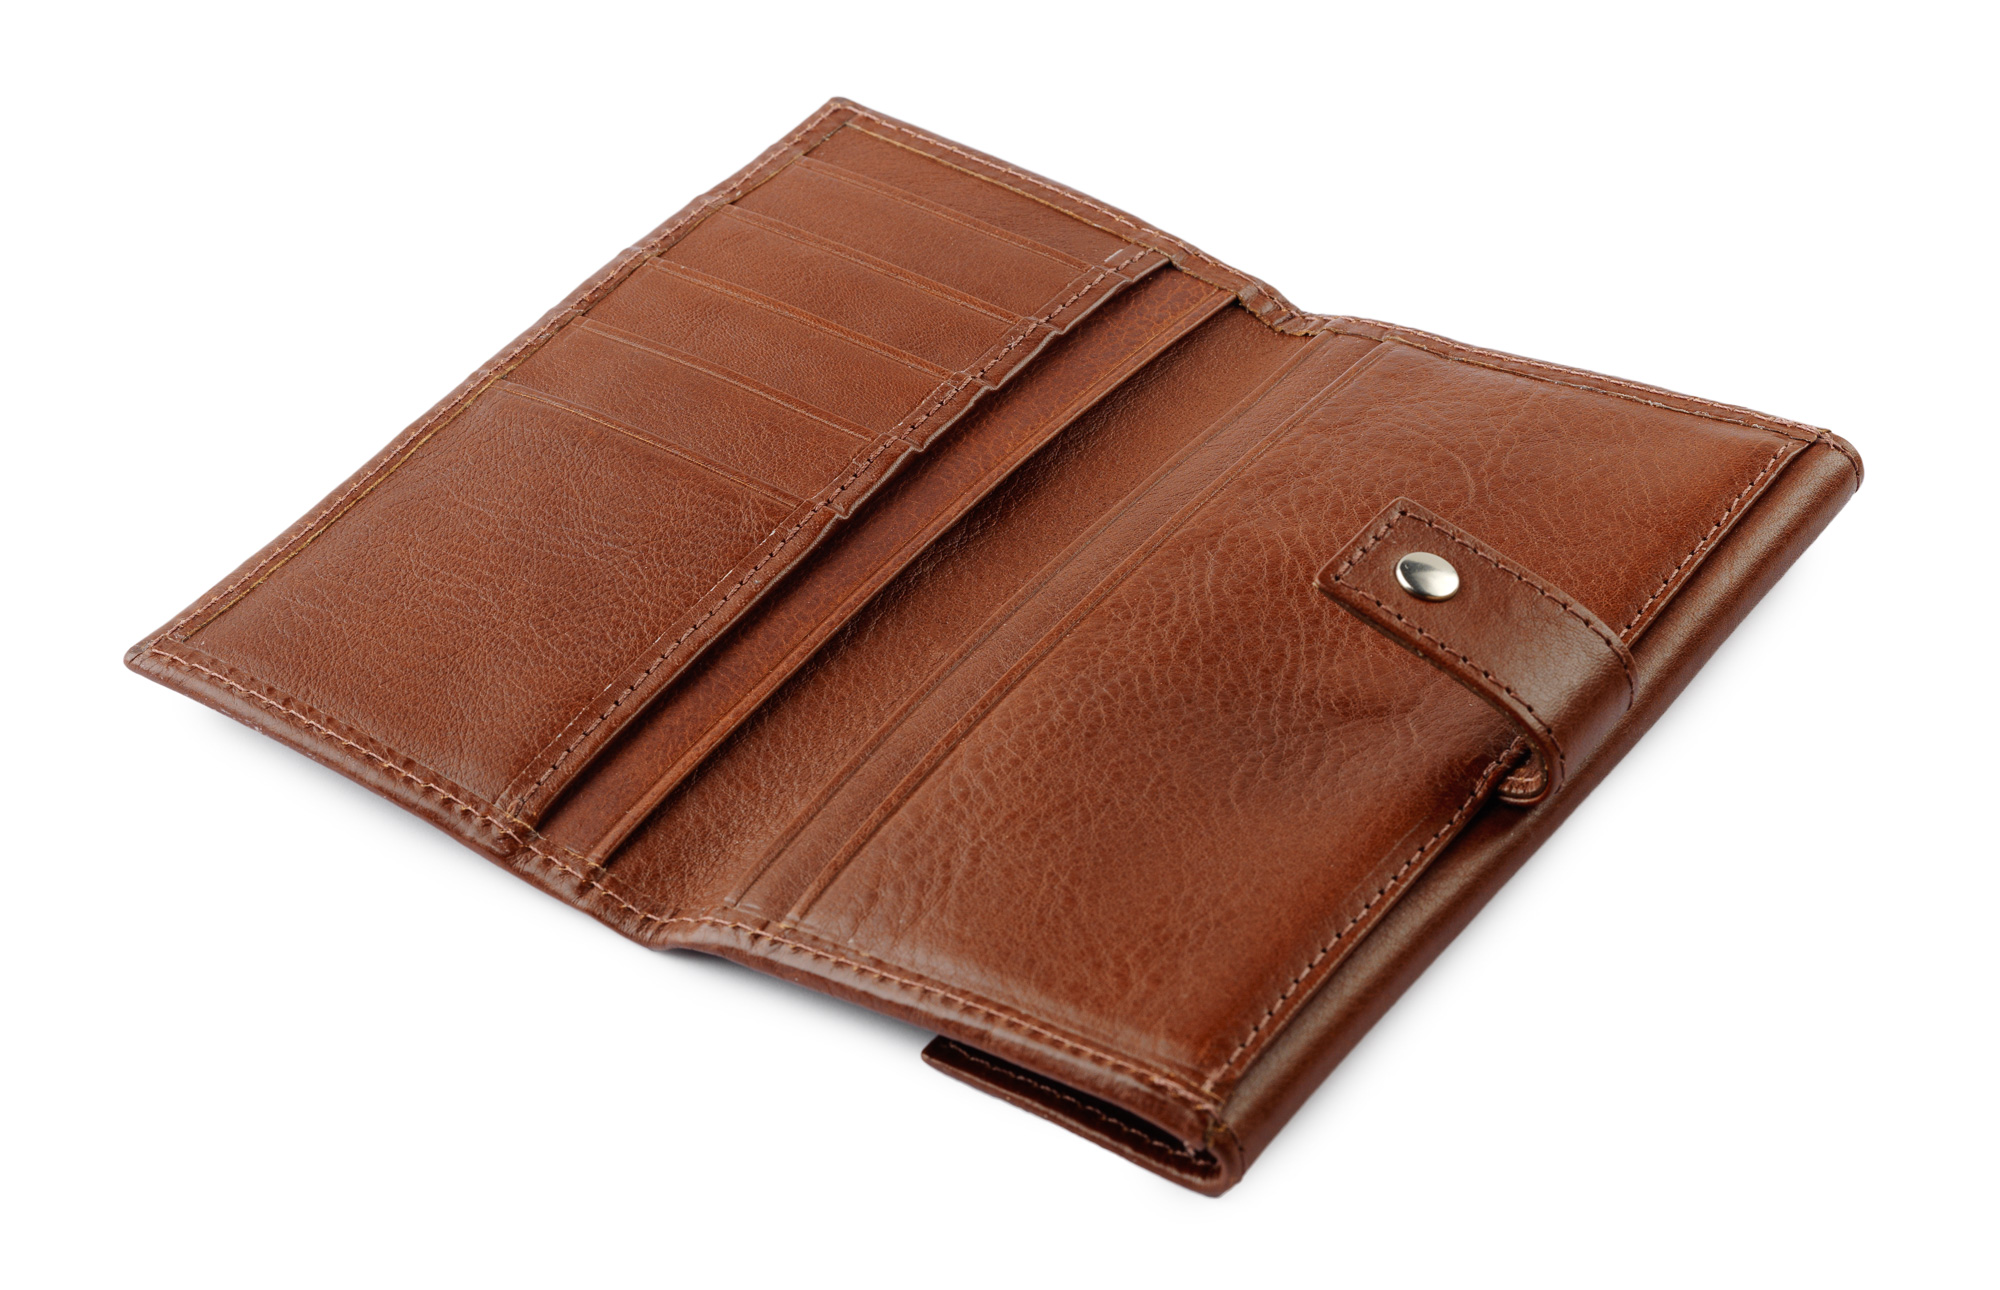 Holden Ladies Leather Wallet Inside Chestnut Copy QC.jpg